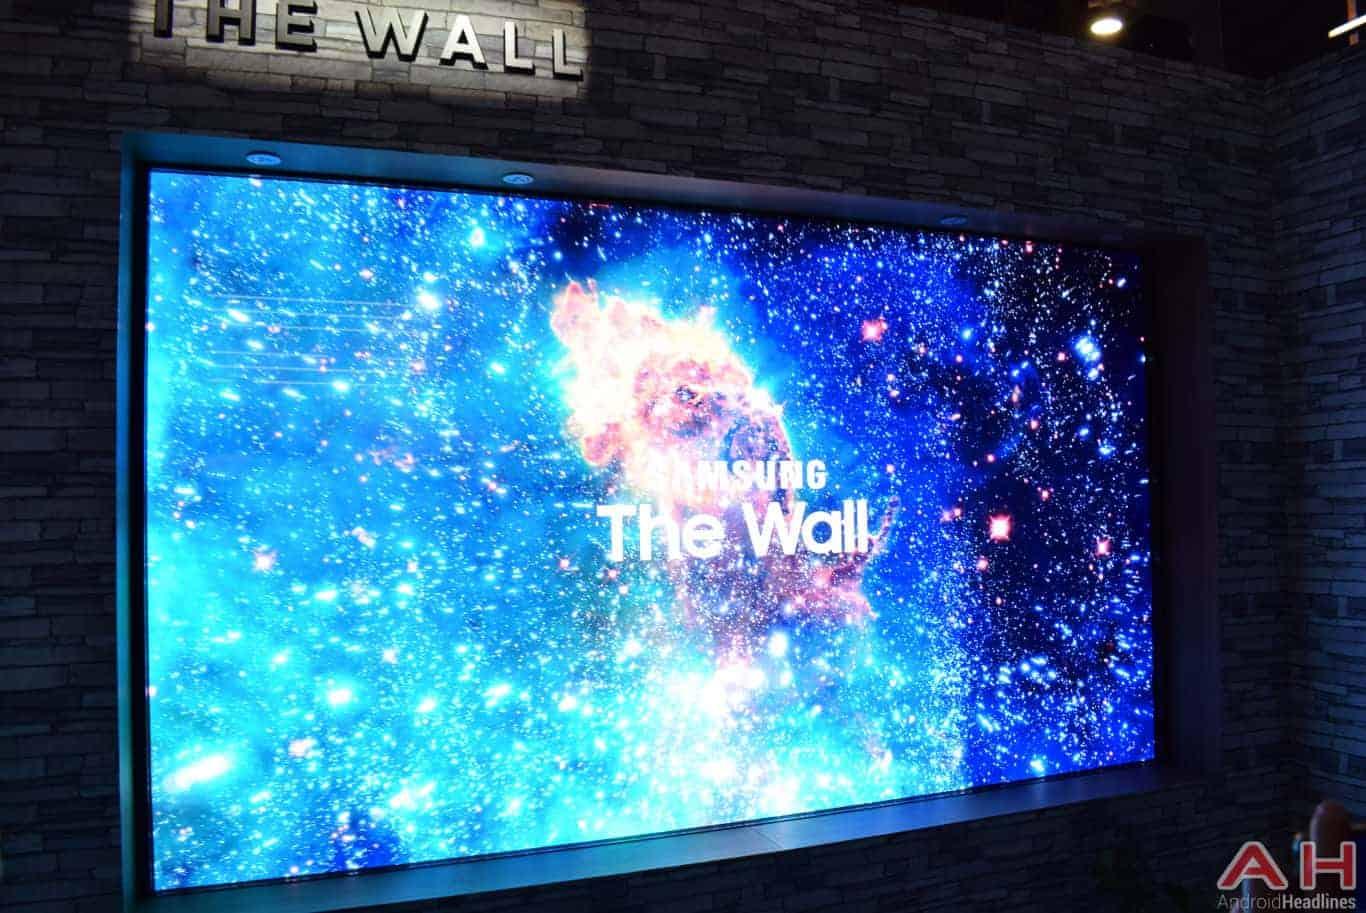 Samsung The Wall Modular MicroLED TV CES 2018 AH 12